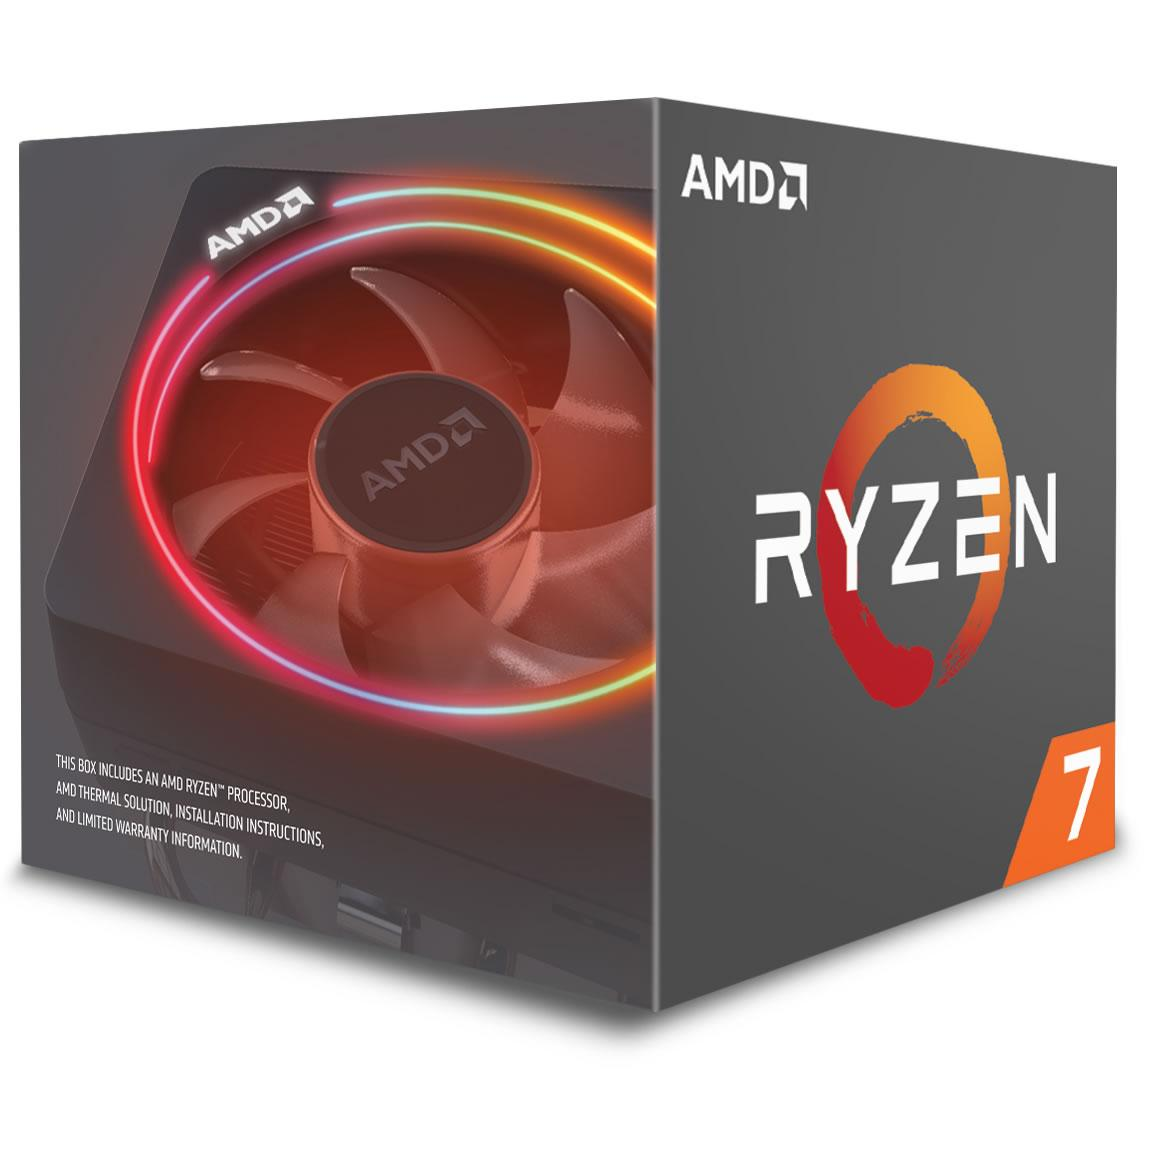 AMD Ryzen 7 2700X 3.7 GHz 8-Core Processor